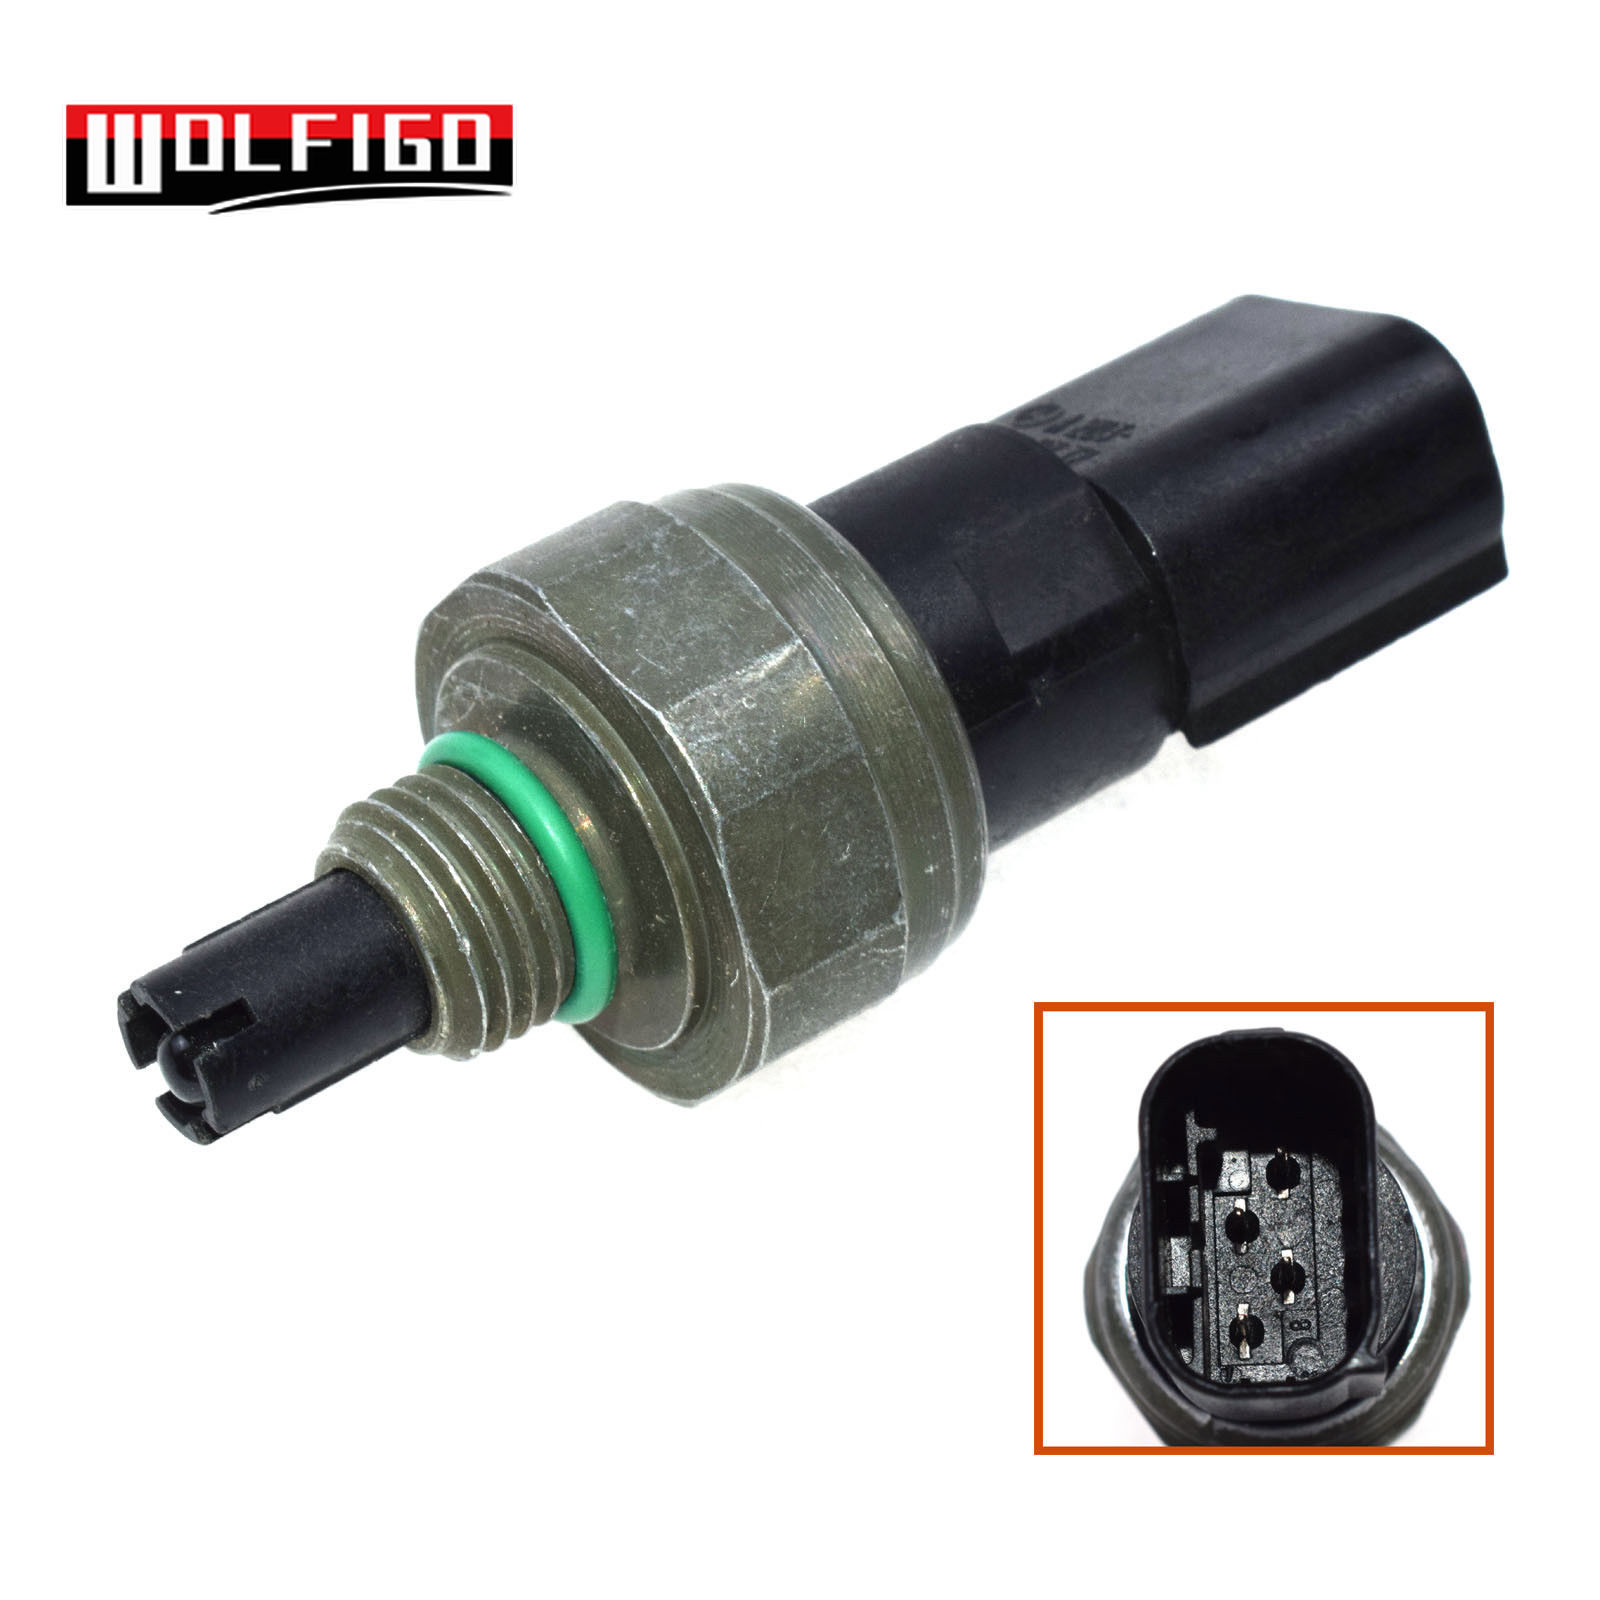 ML500 New A//C Pressure Switch for Mercedes-Benz ML320 ML350 OE# 2038300472